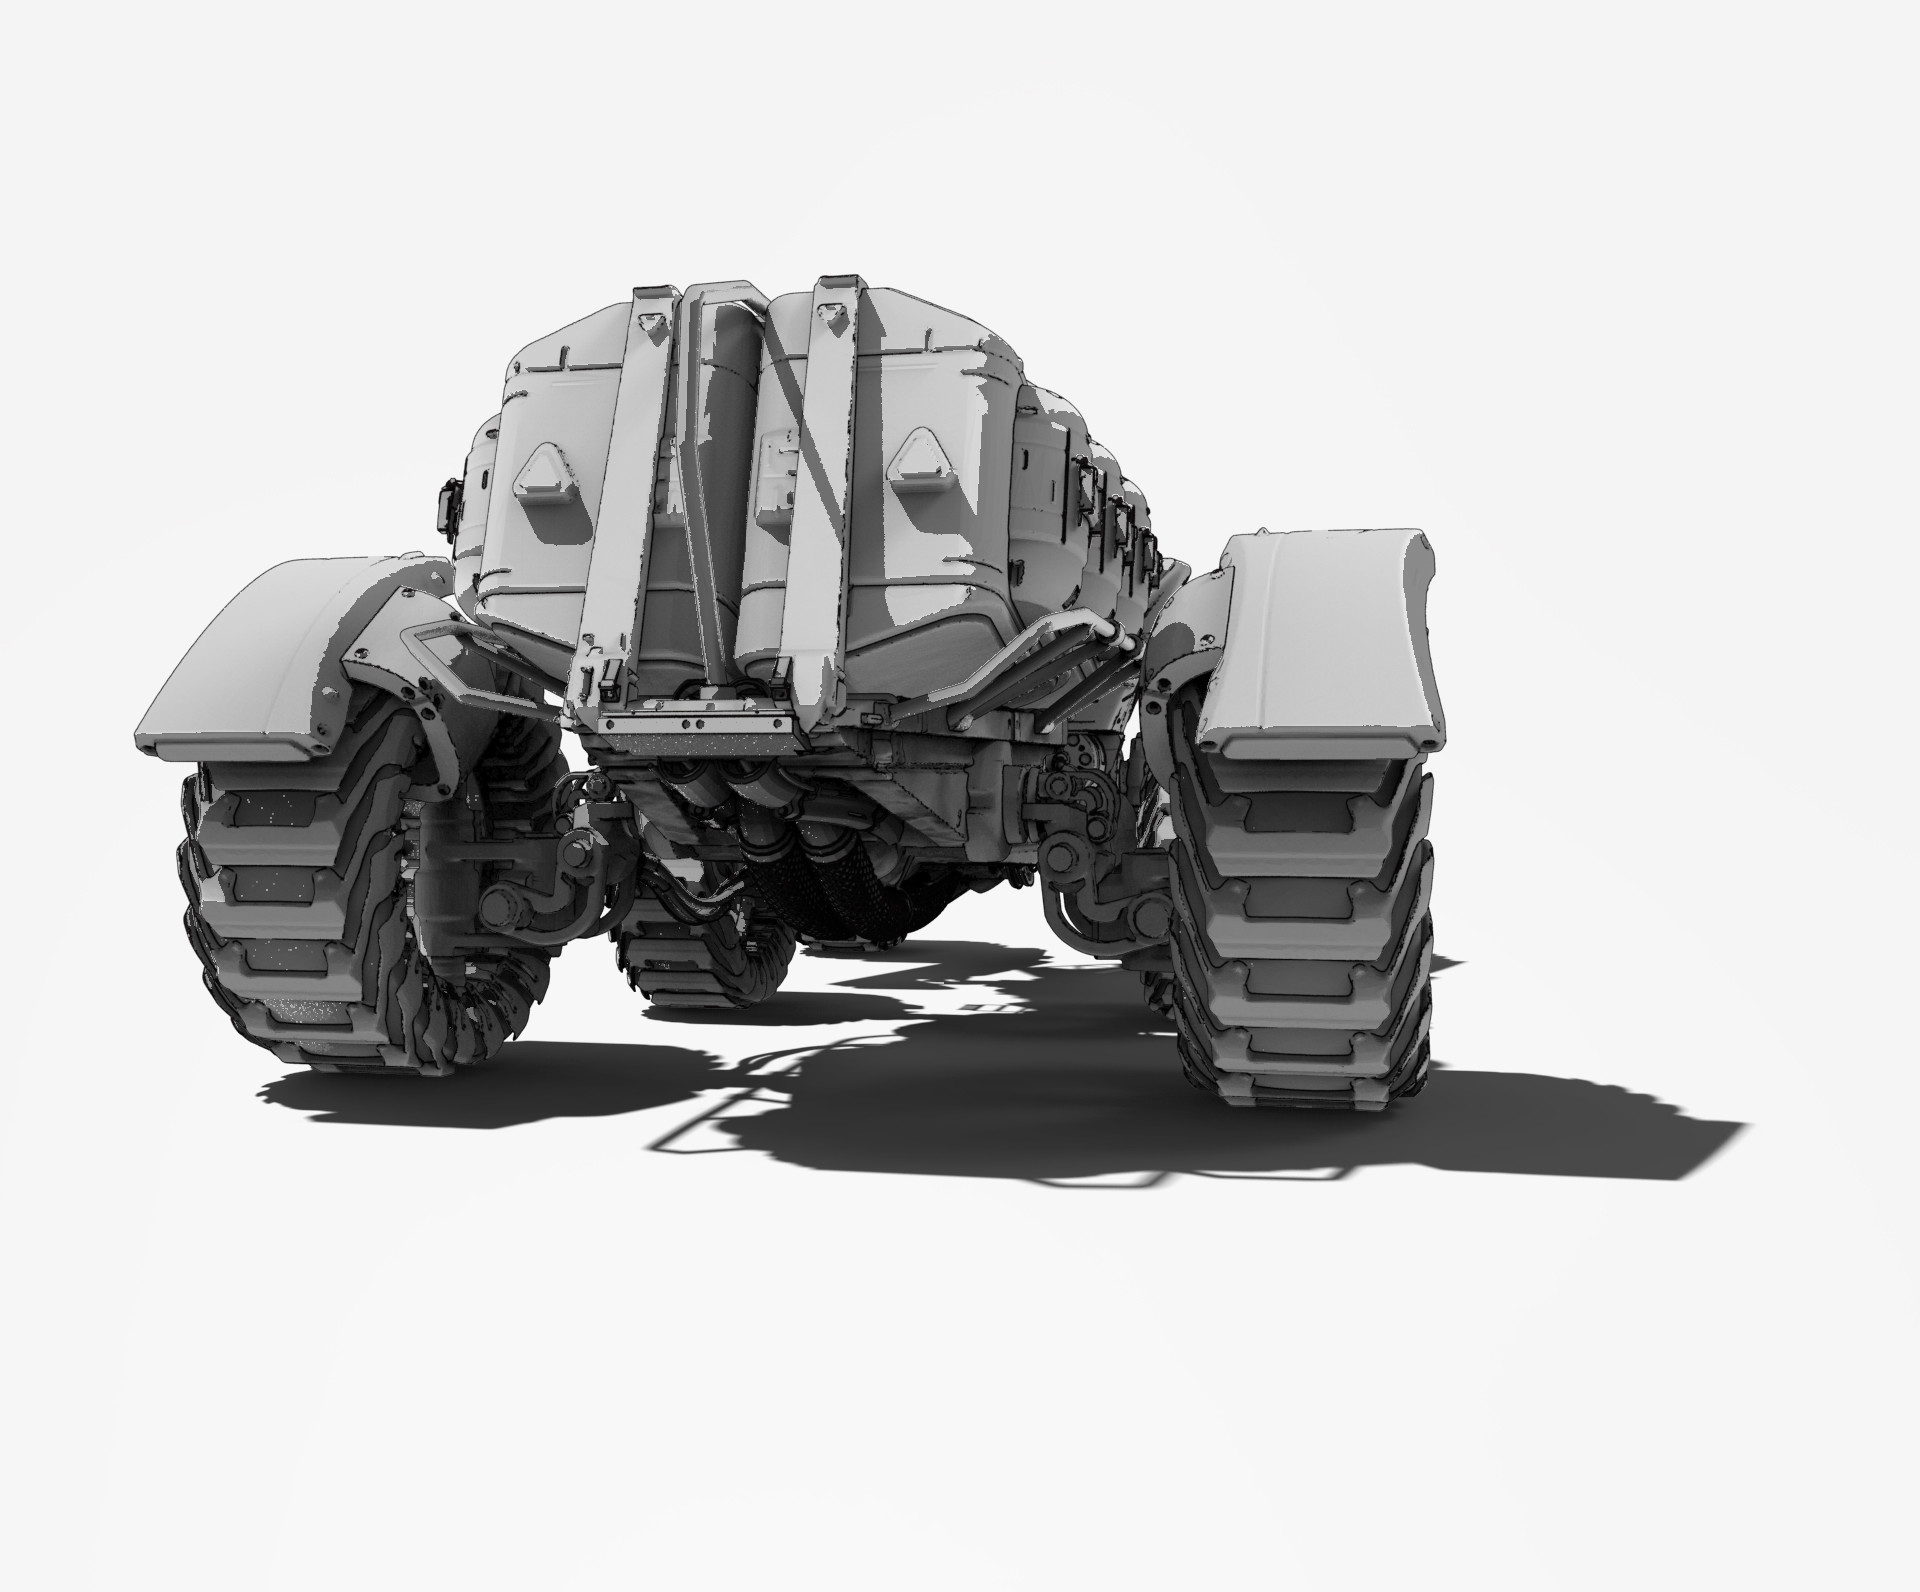 Roberto robert mars buggy kitbash 61